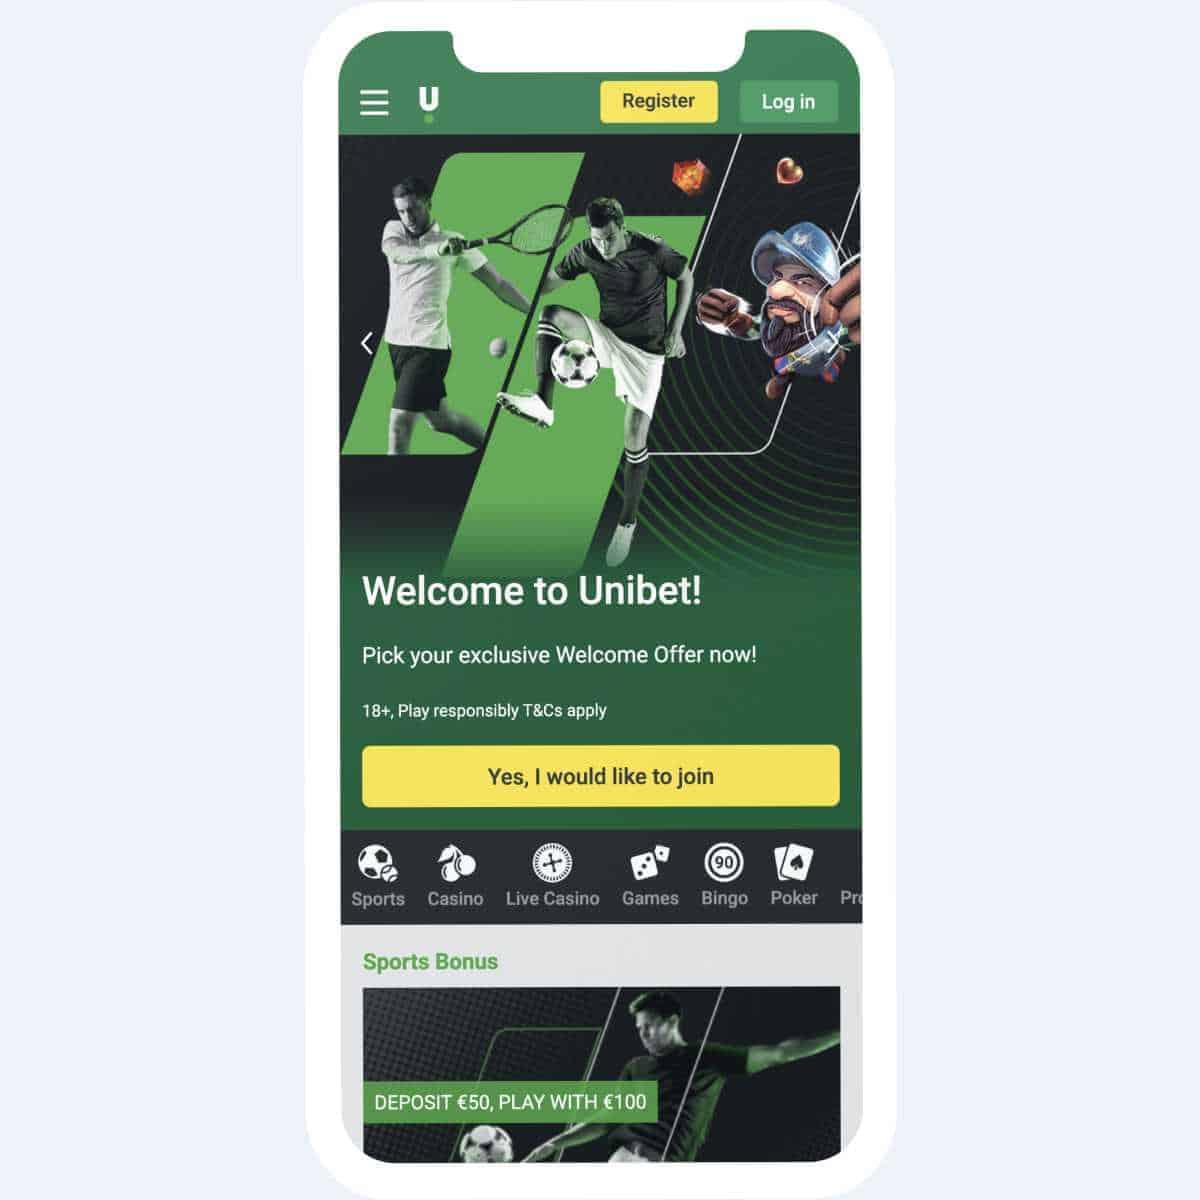 unibet homepage mobile